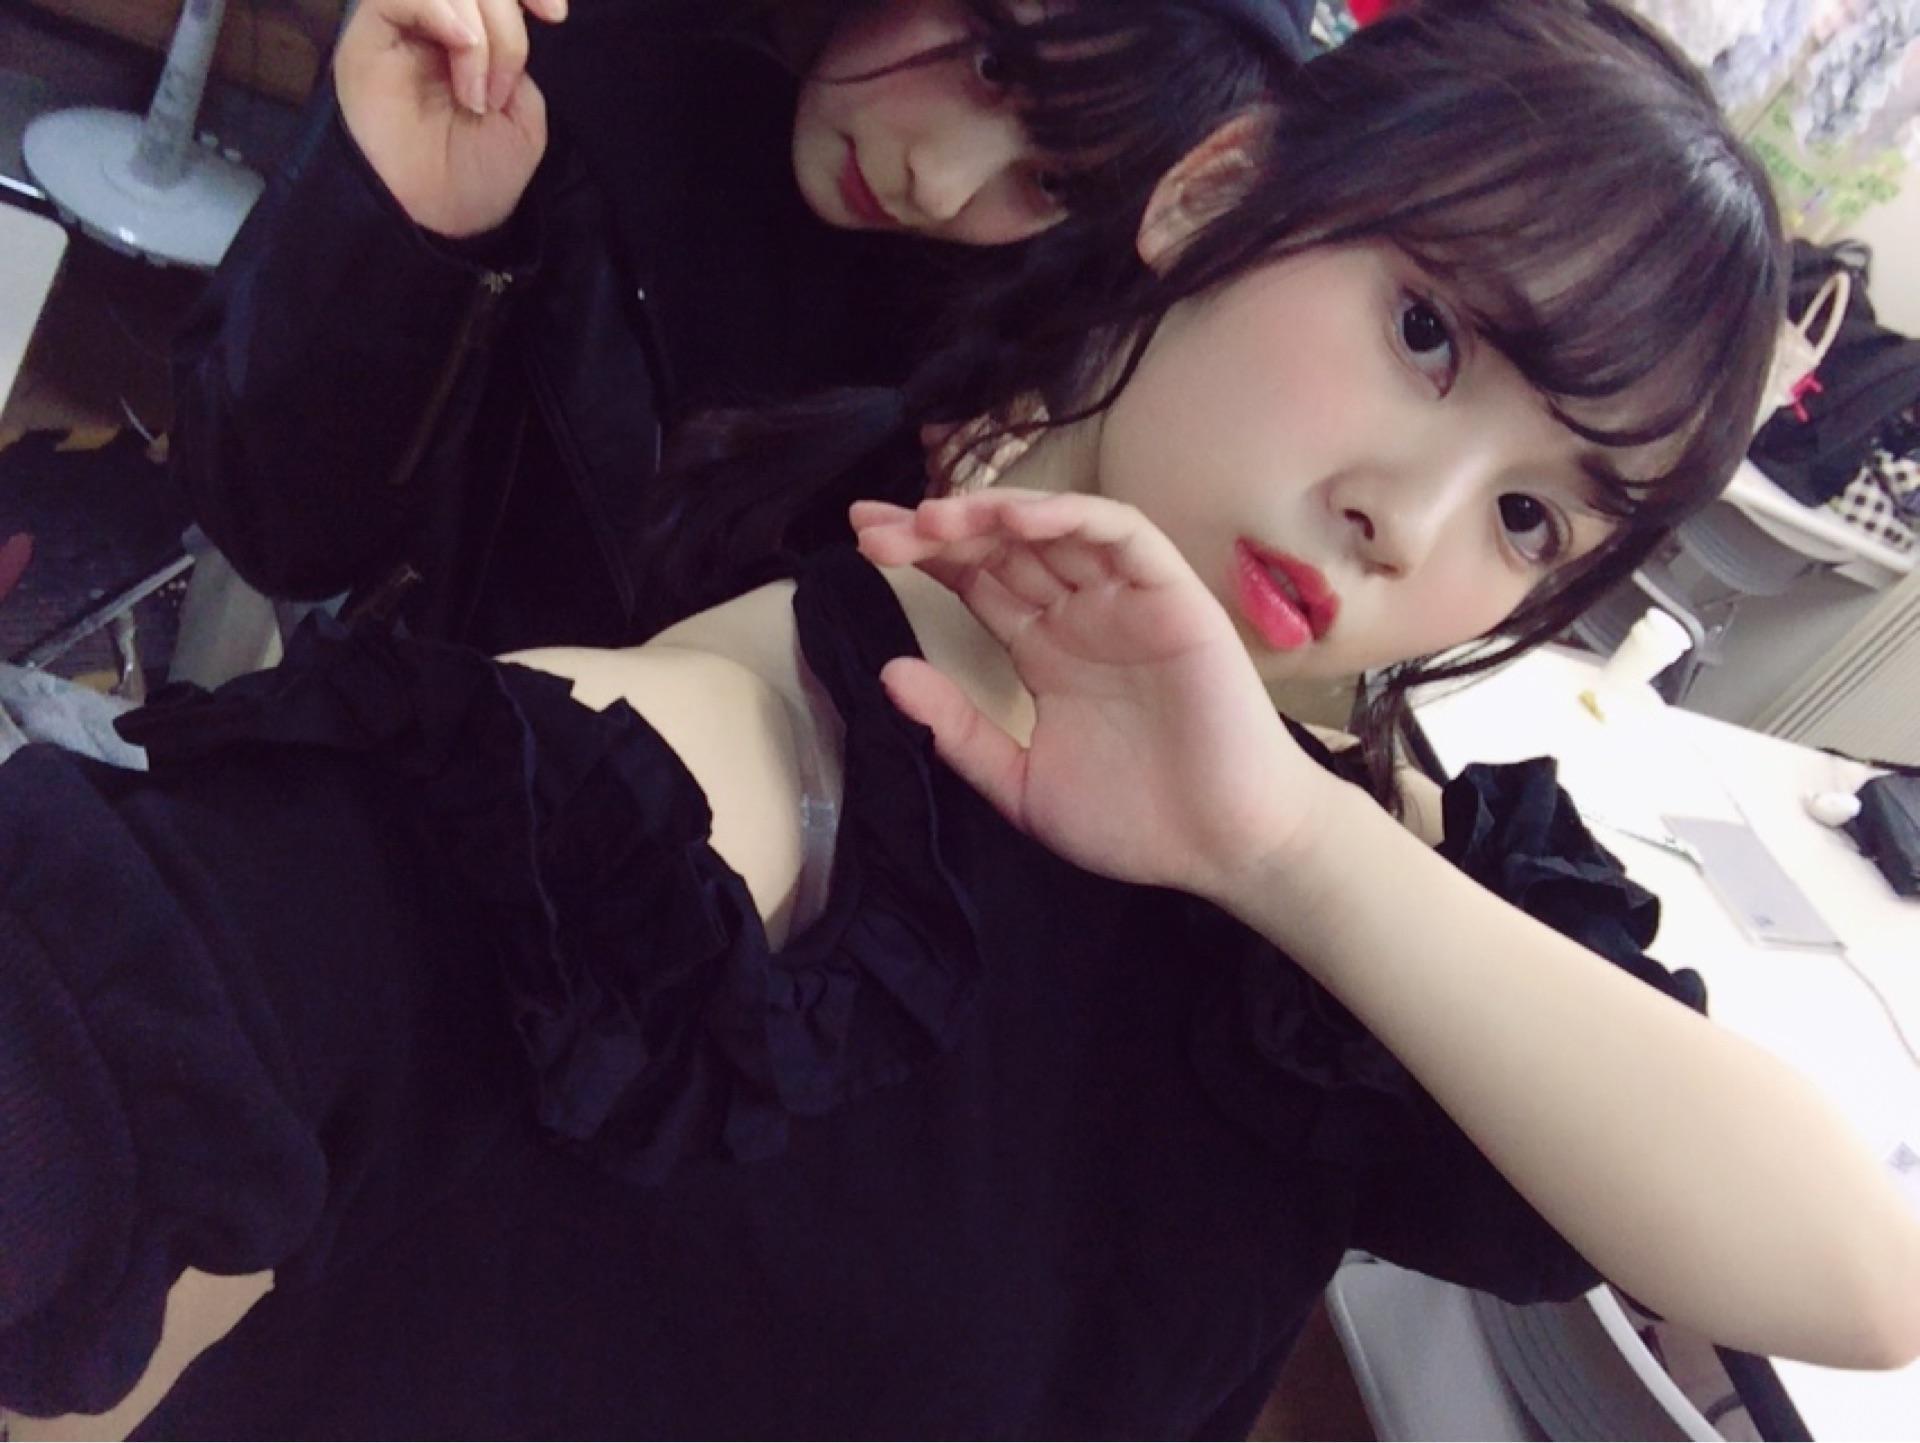 【HKT48】山内祐奈ちゃん応援スレ☆5【ゆうな】©2ch.netYouTube動画>18本 ->画像>640枚